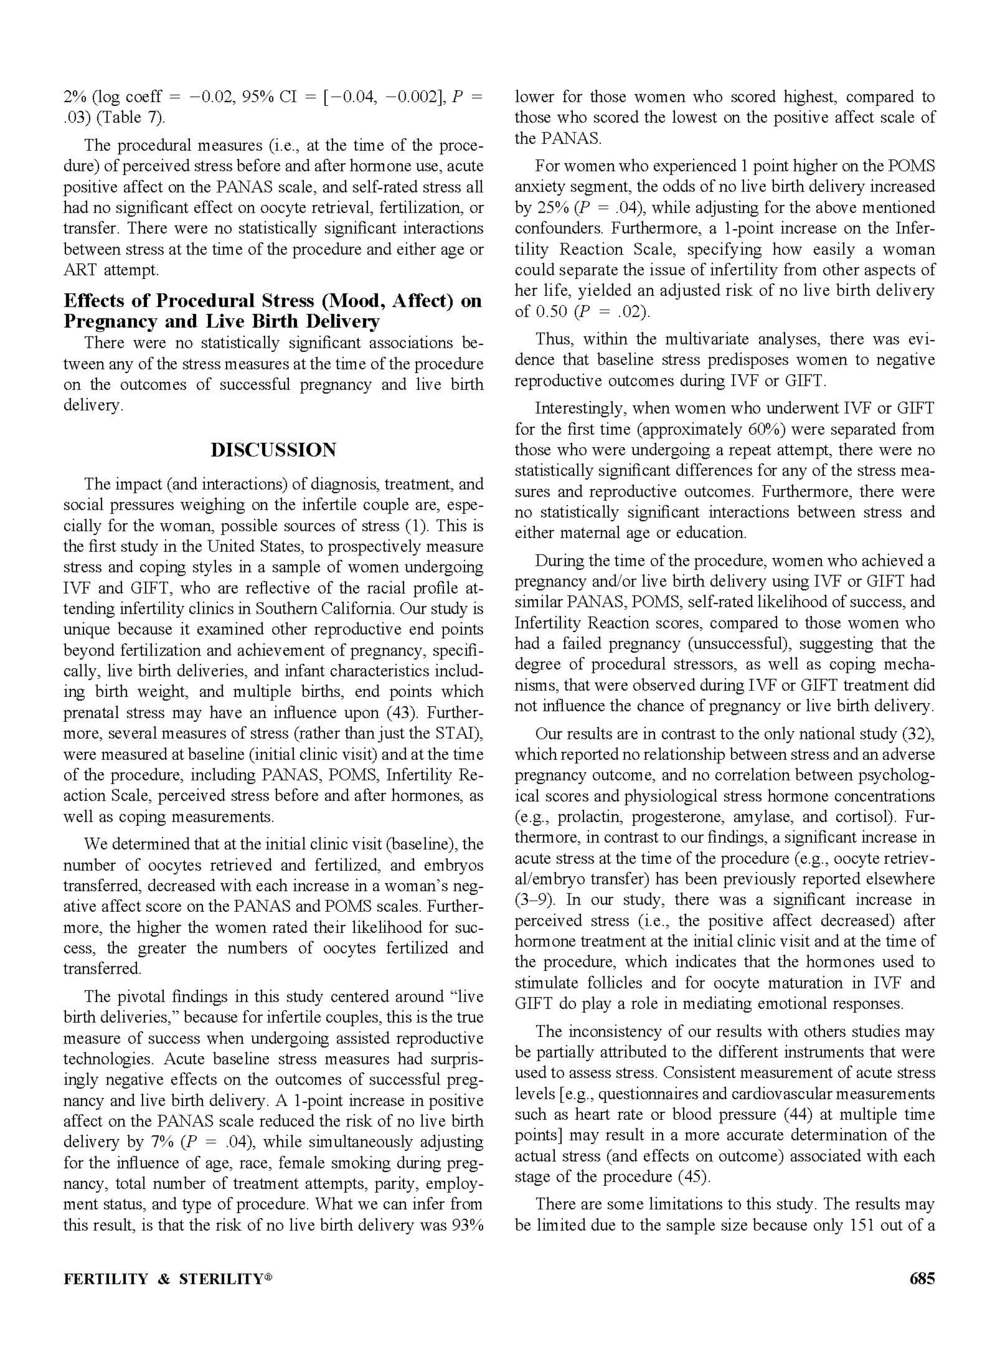 Research_3_pg10.jpg